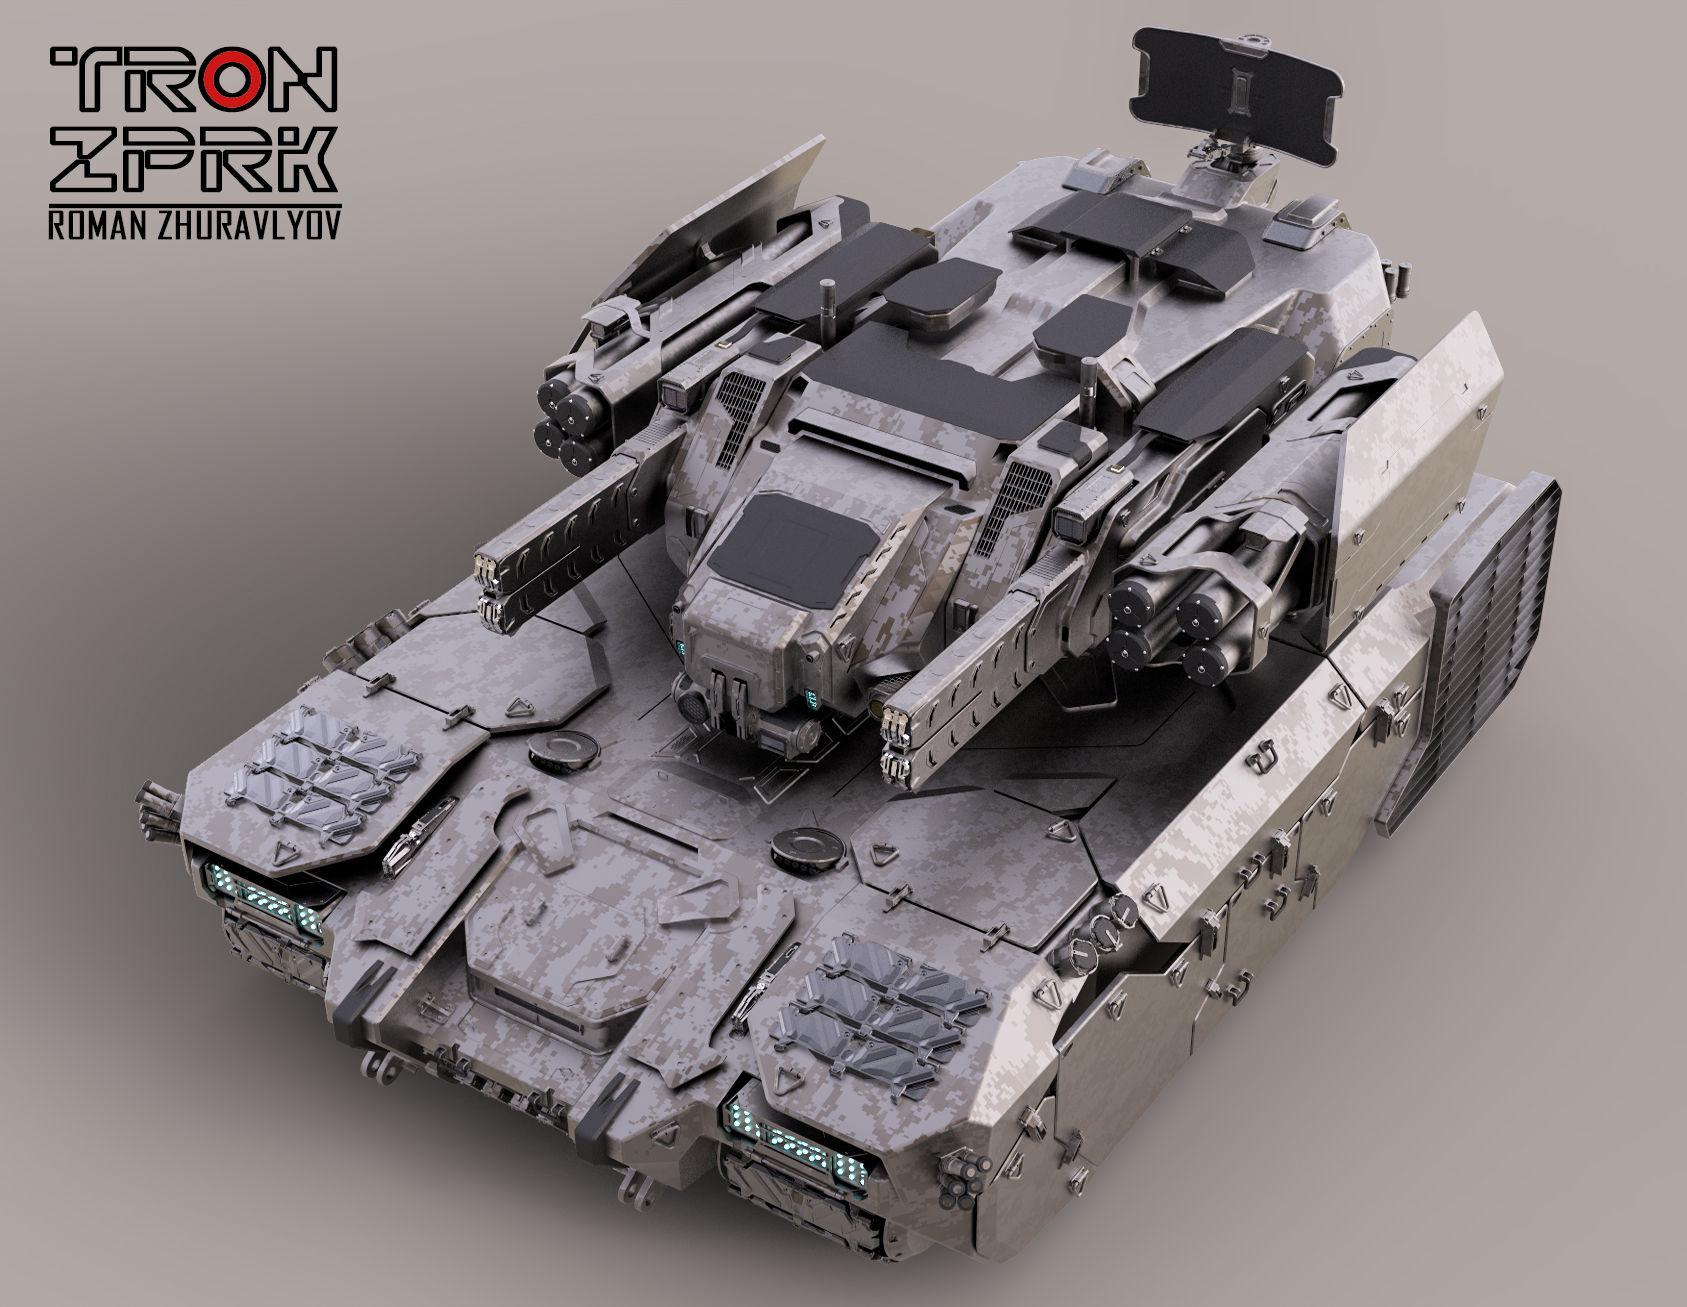 Zprk-tron-4-3500-3500